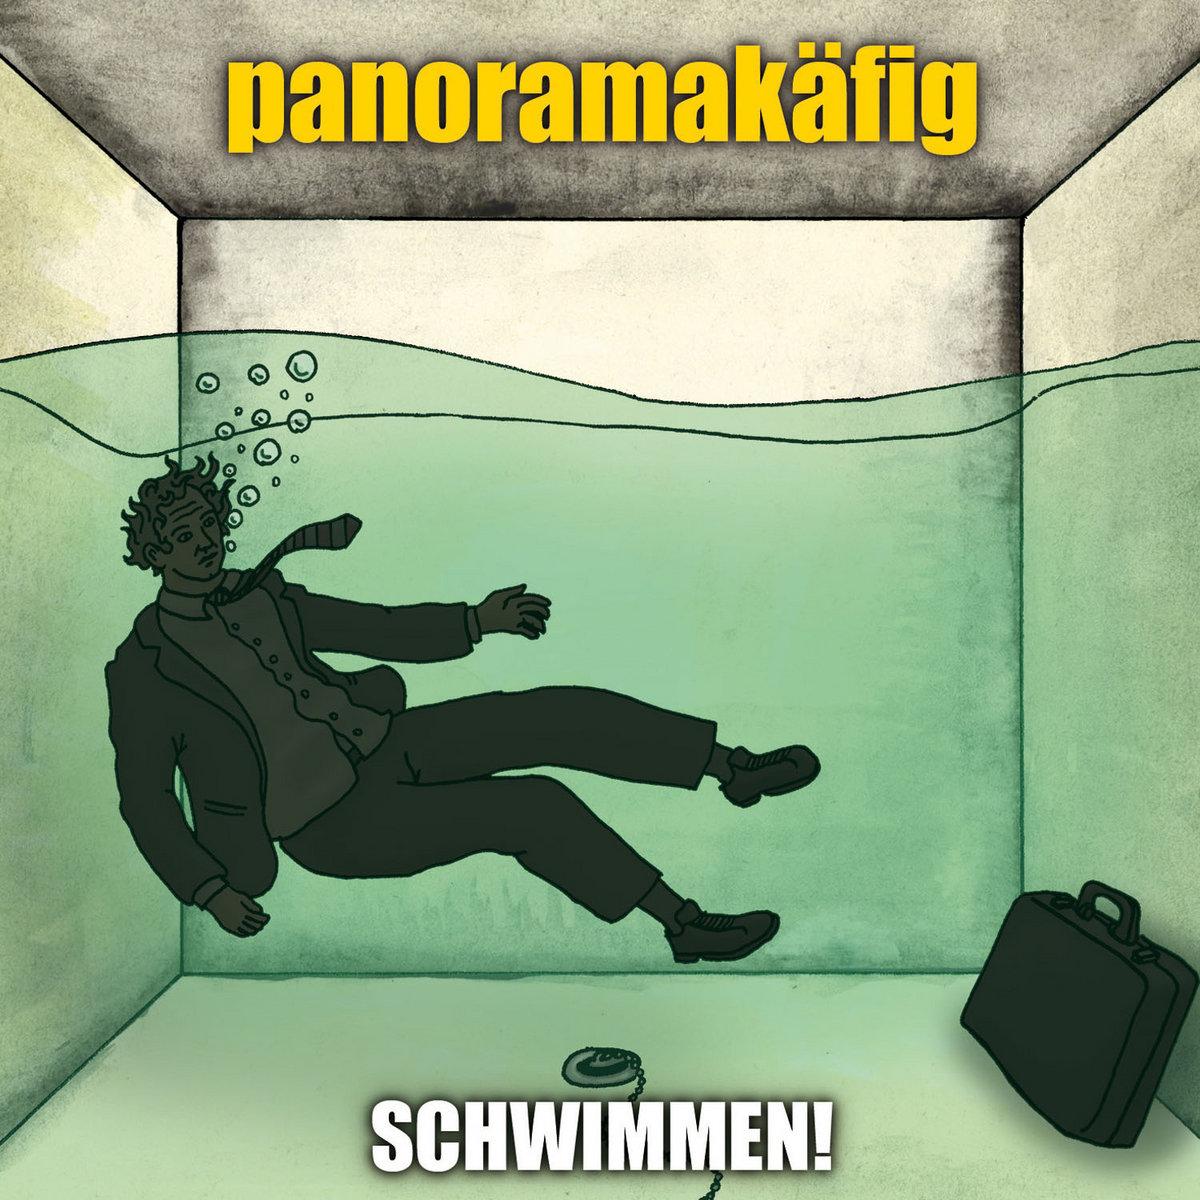 Panoramakäfig - Schwimmen! - CD